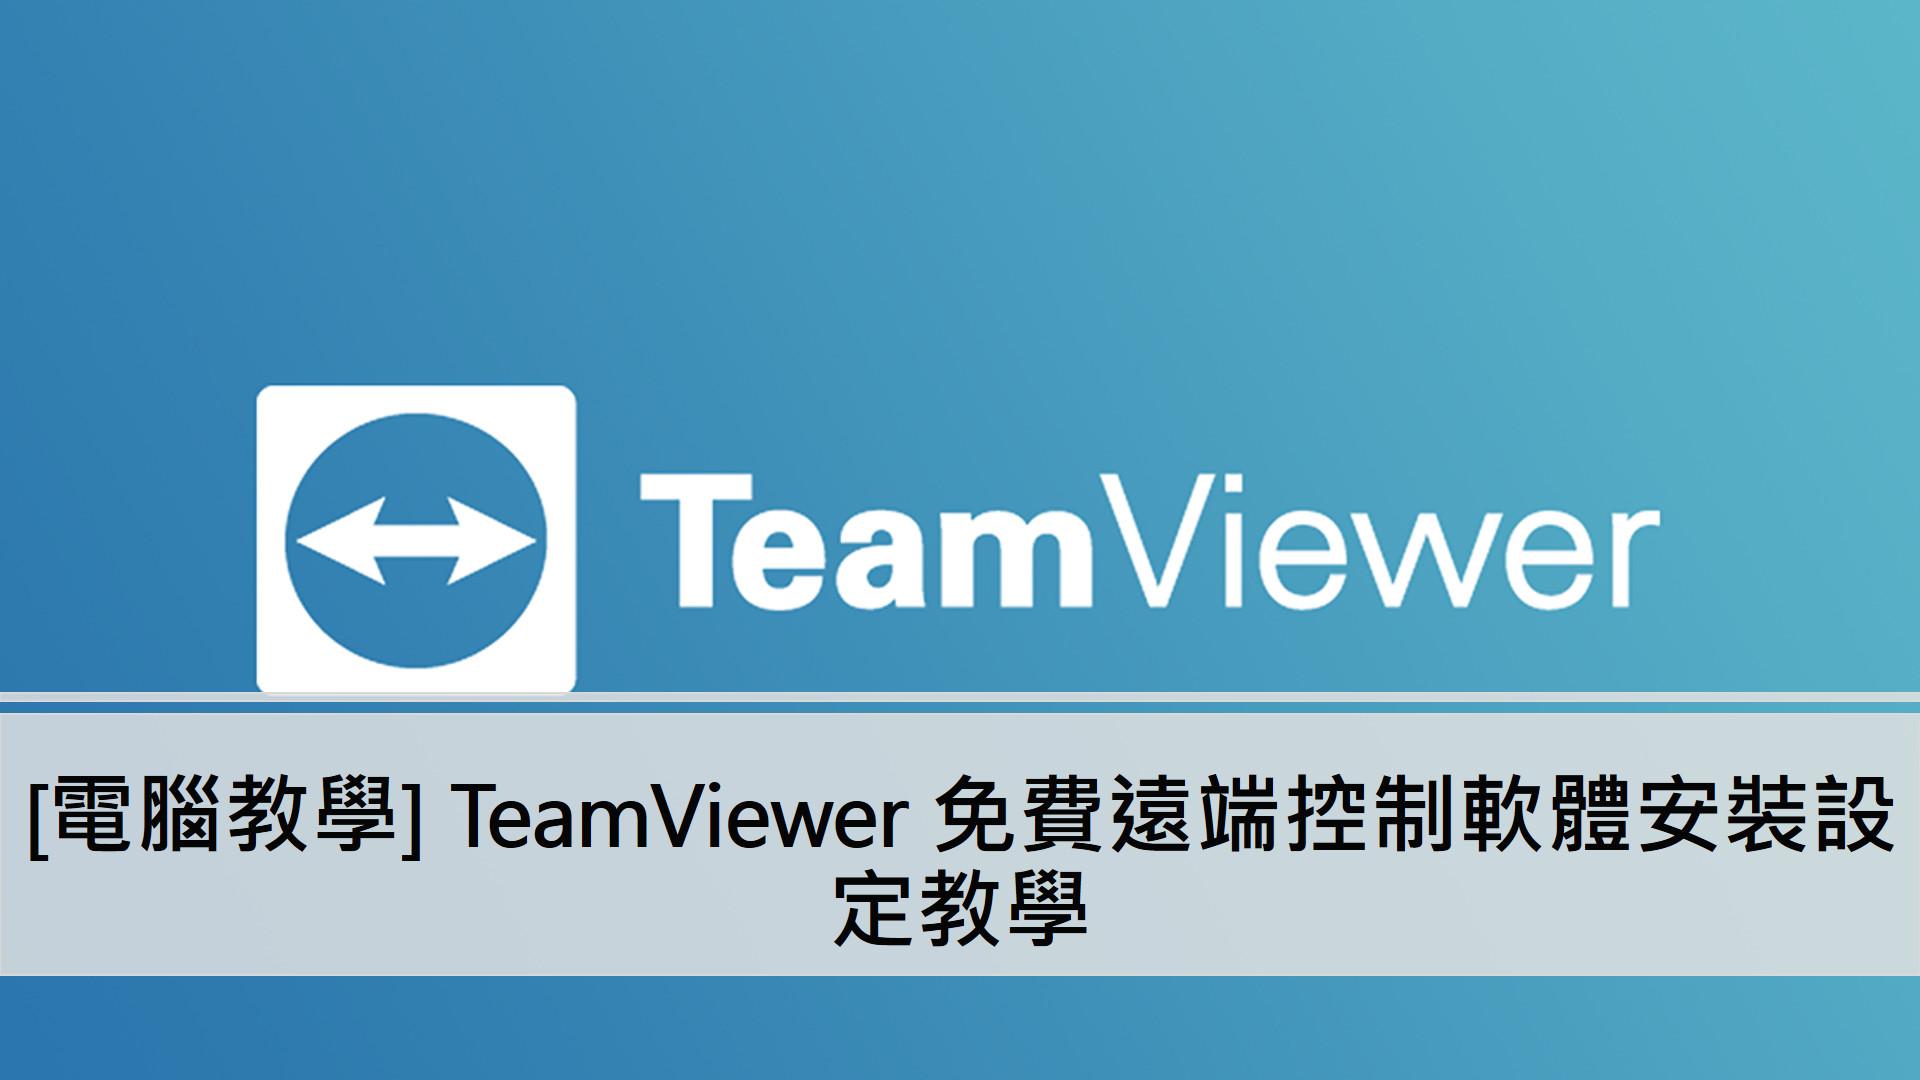 Teamviewer Introduce Index